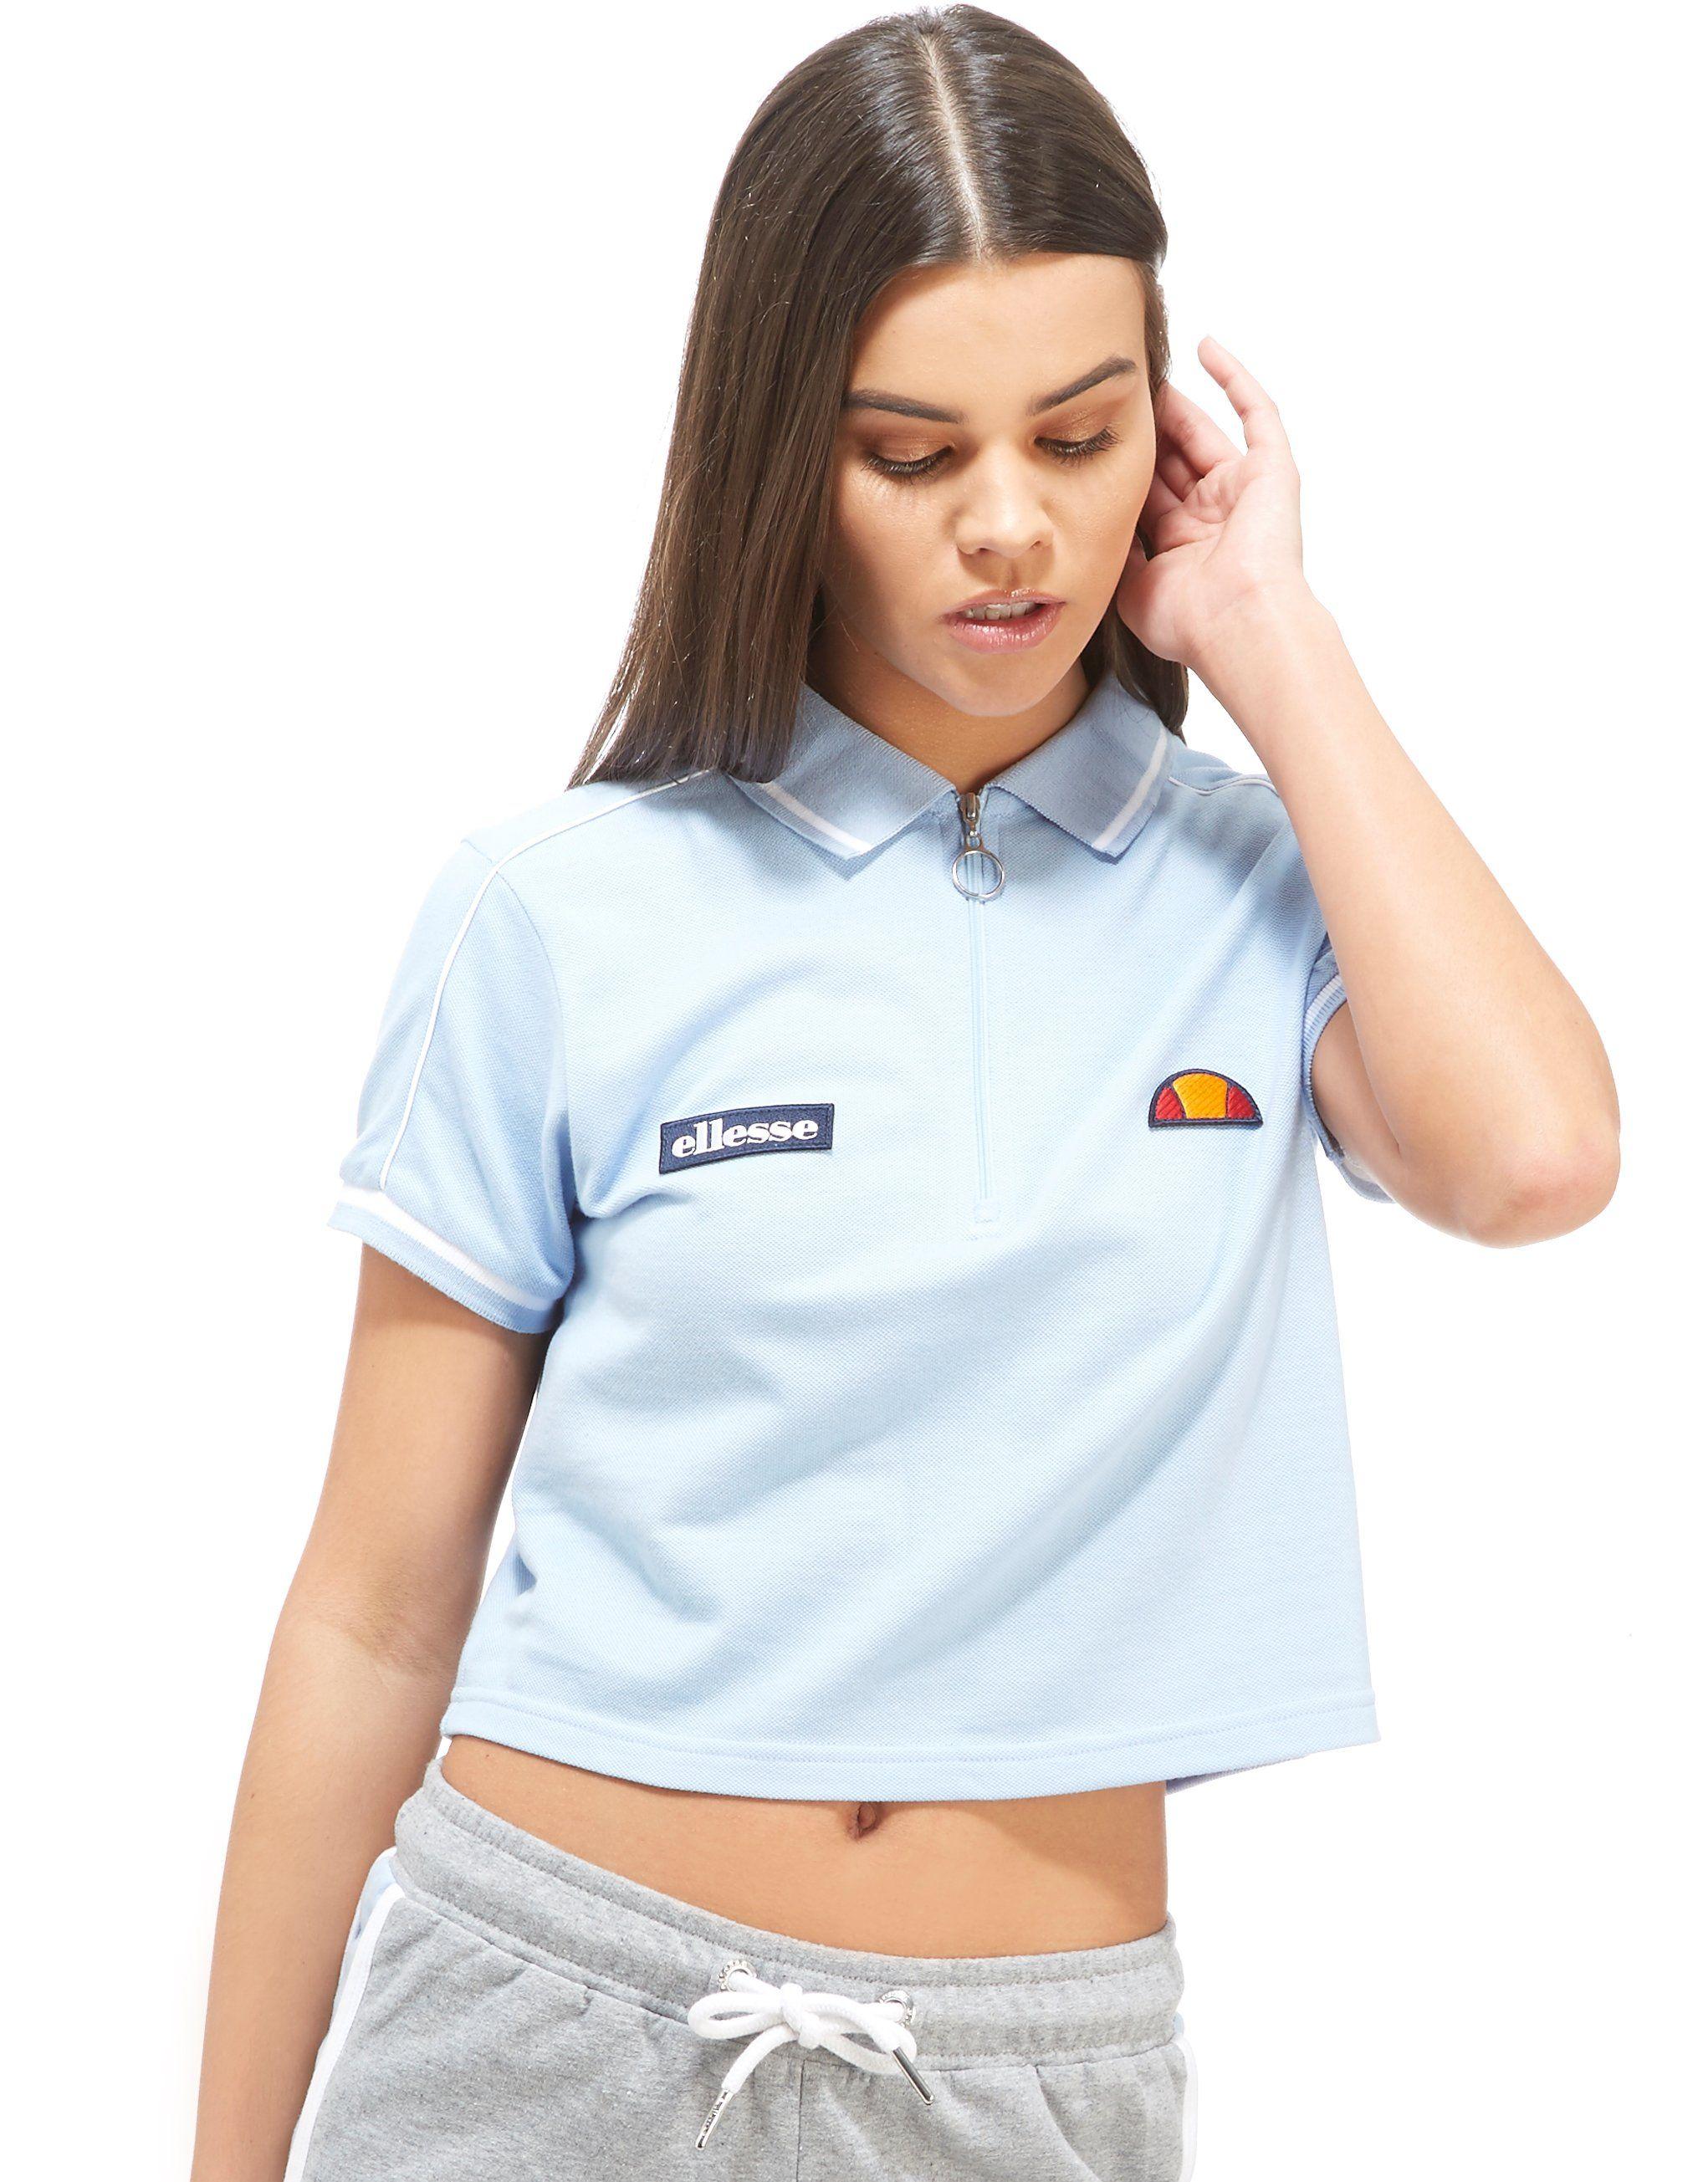 Ellesse t shirt white womens - 1 Review Ellesse Crop Zip Polo Shirt